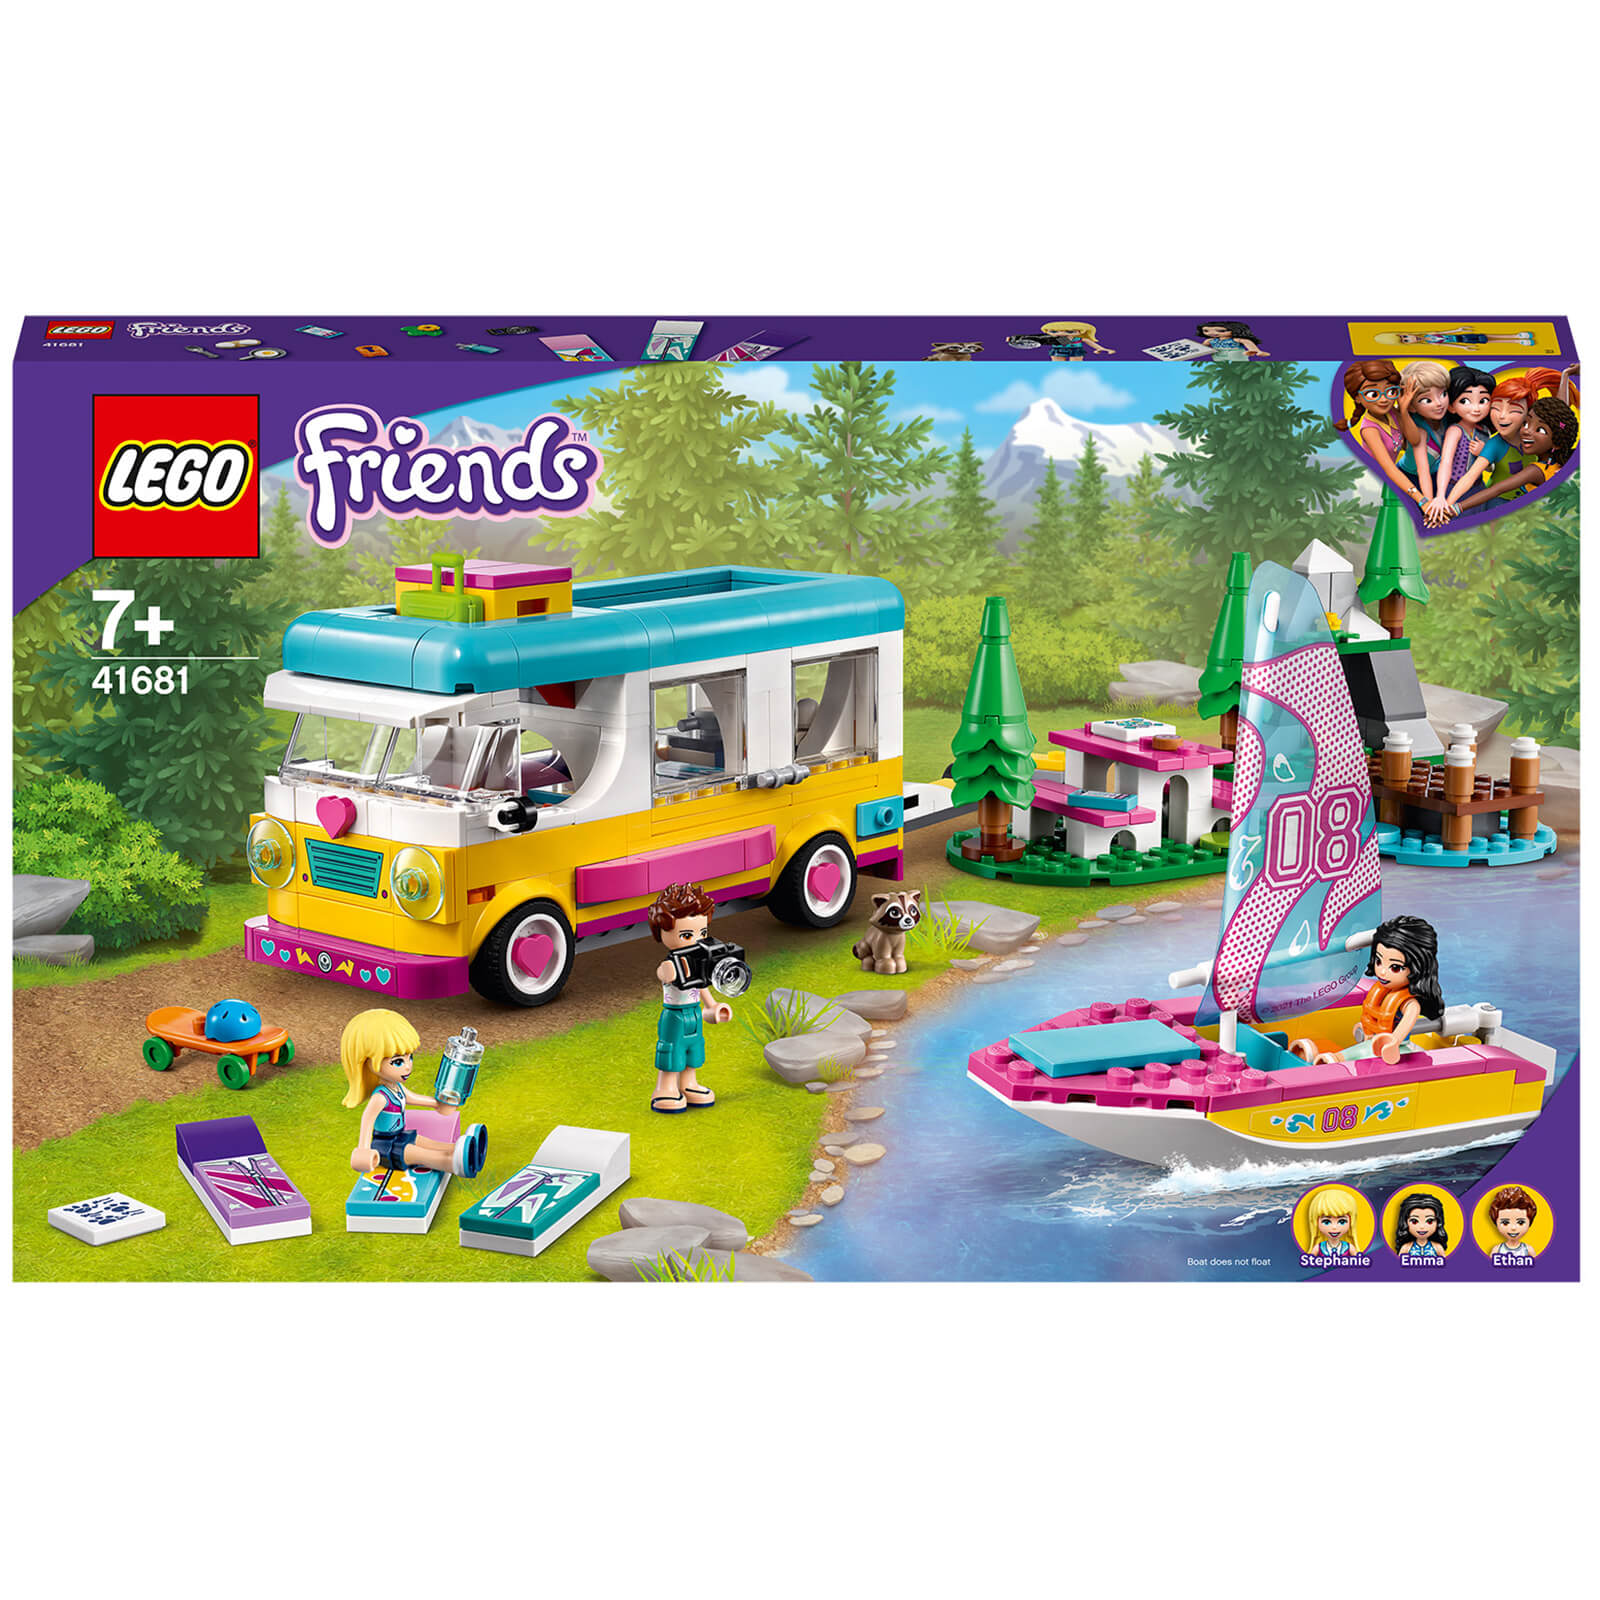 LEGO Friends Forest Camper Van And Sailboat Set (41681)